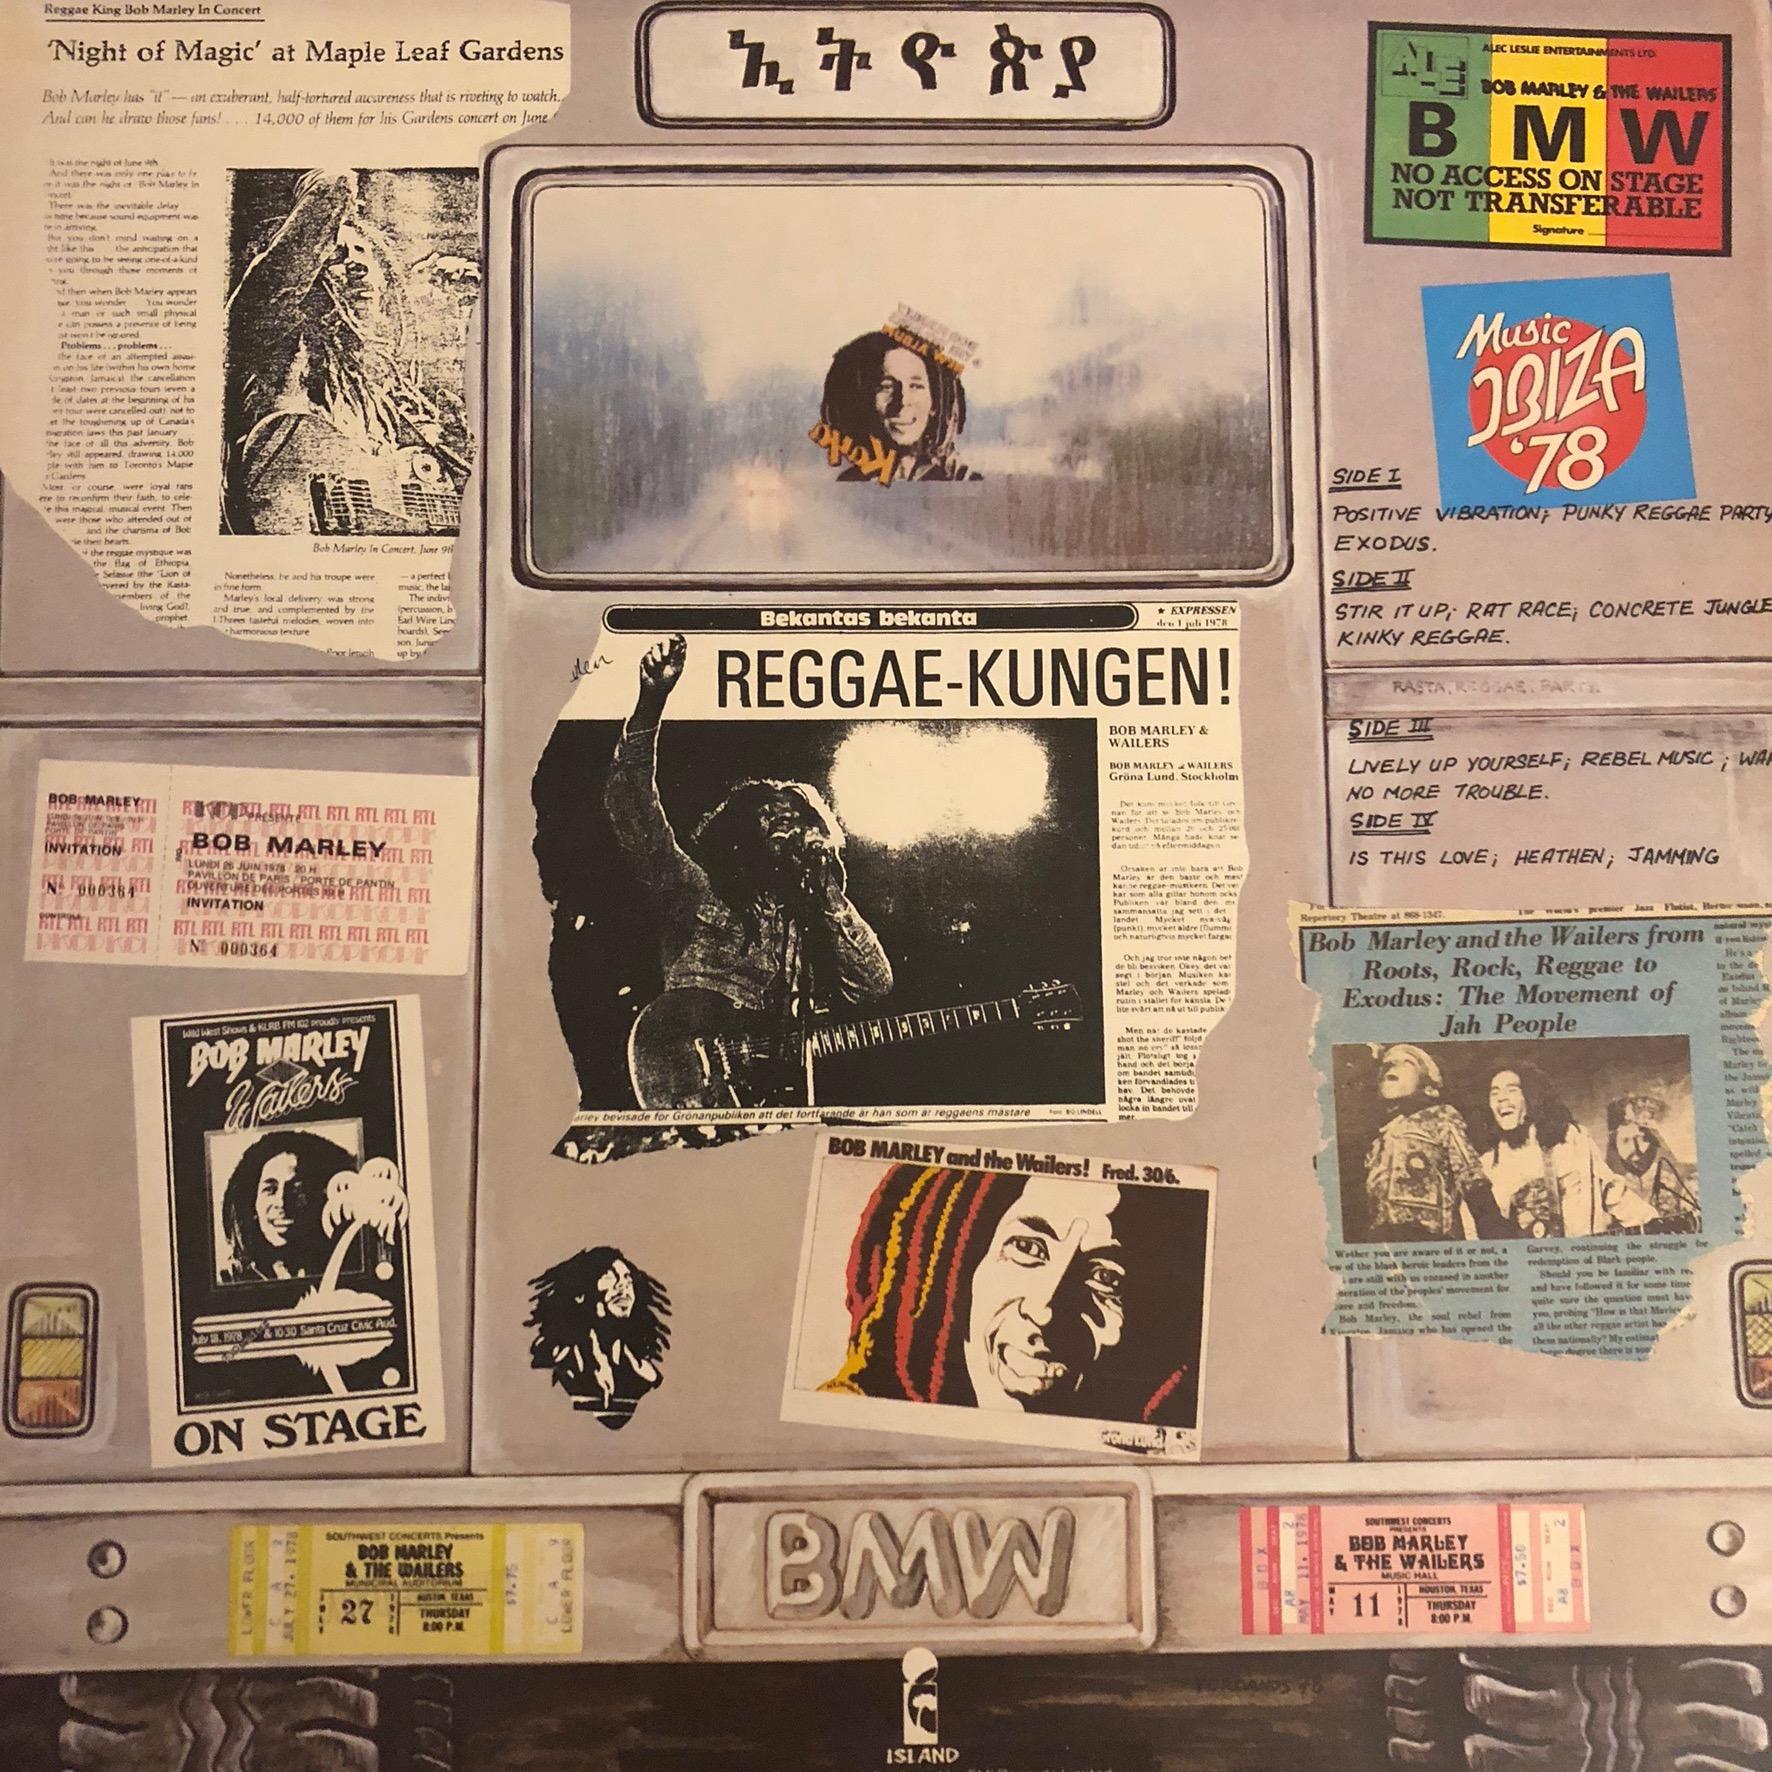 Bob Marley - Babylon by bus - Back Cover